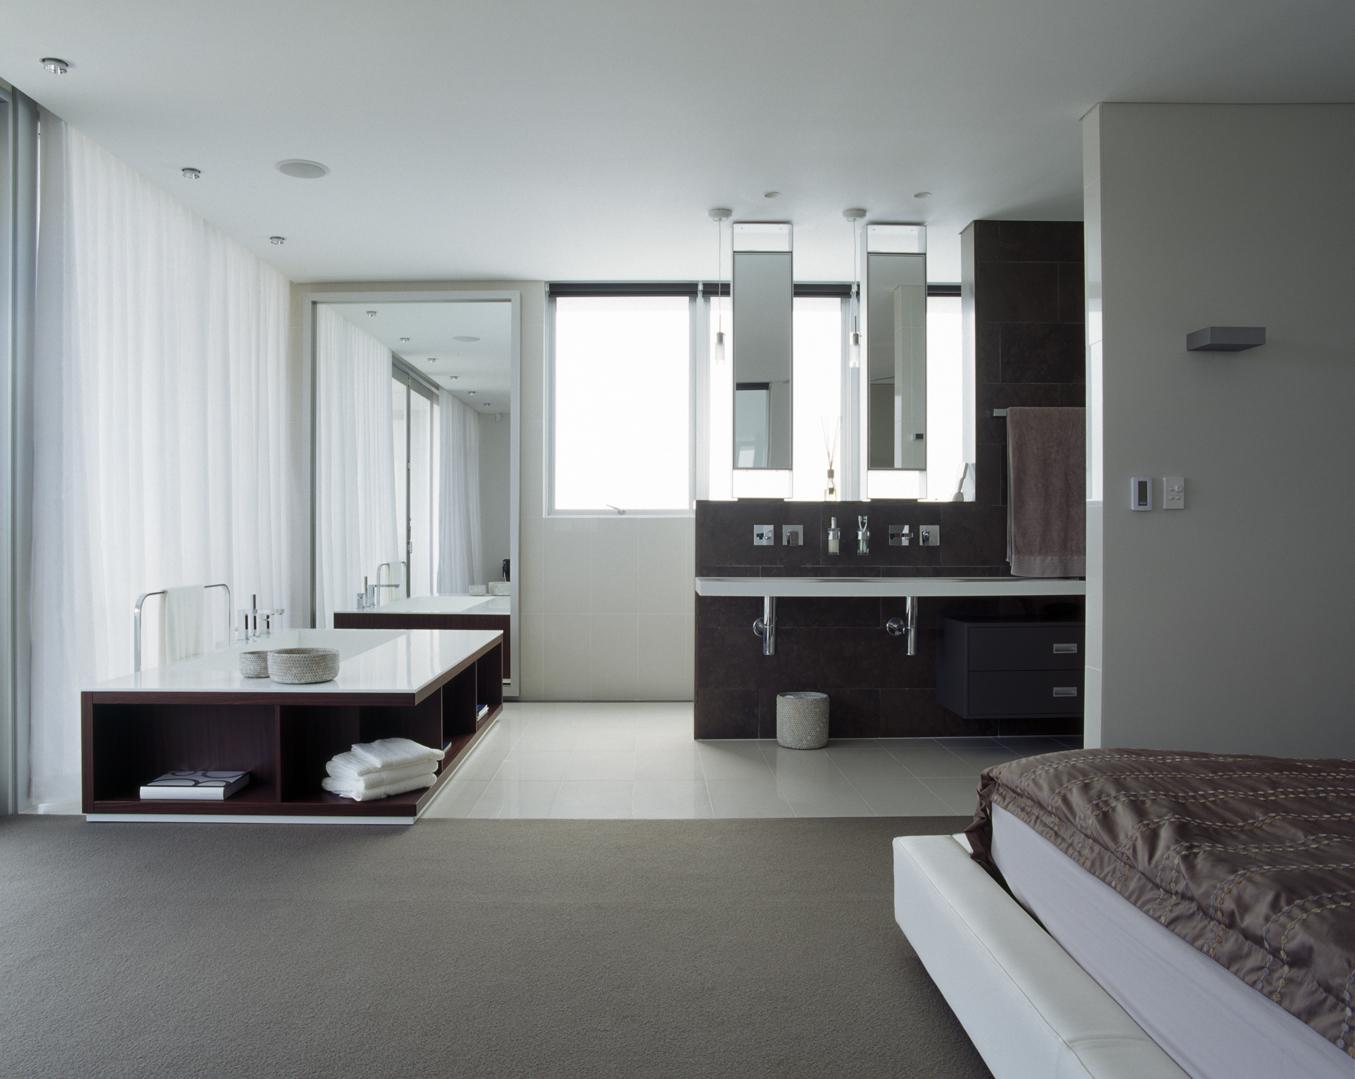 Minosa: The new Modern Design - Parents Retreat vs Ensuite ...